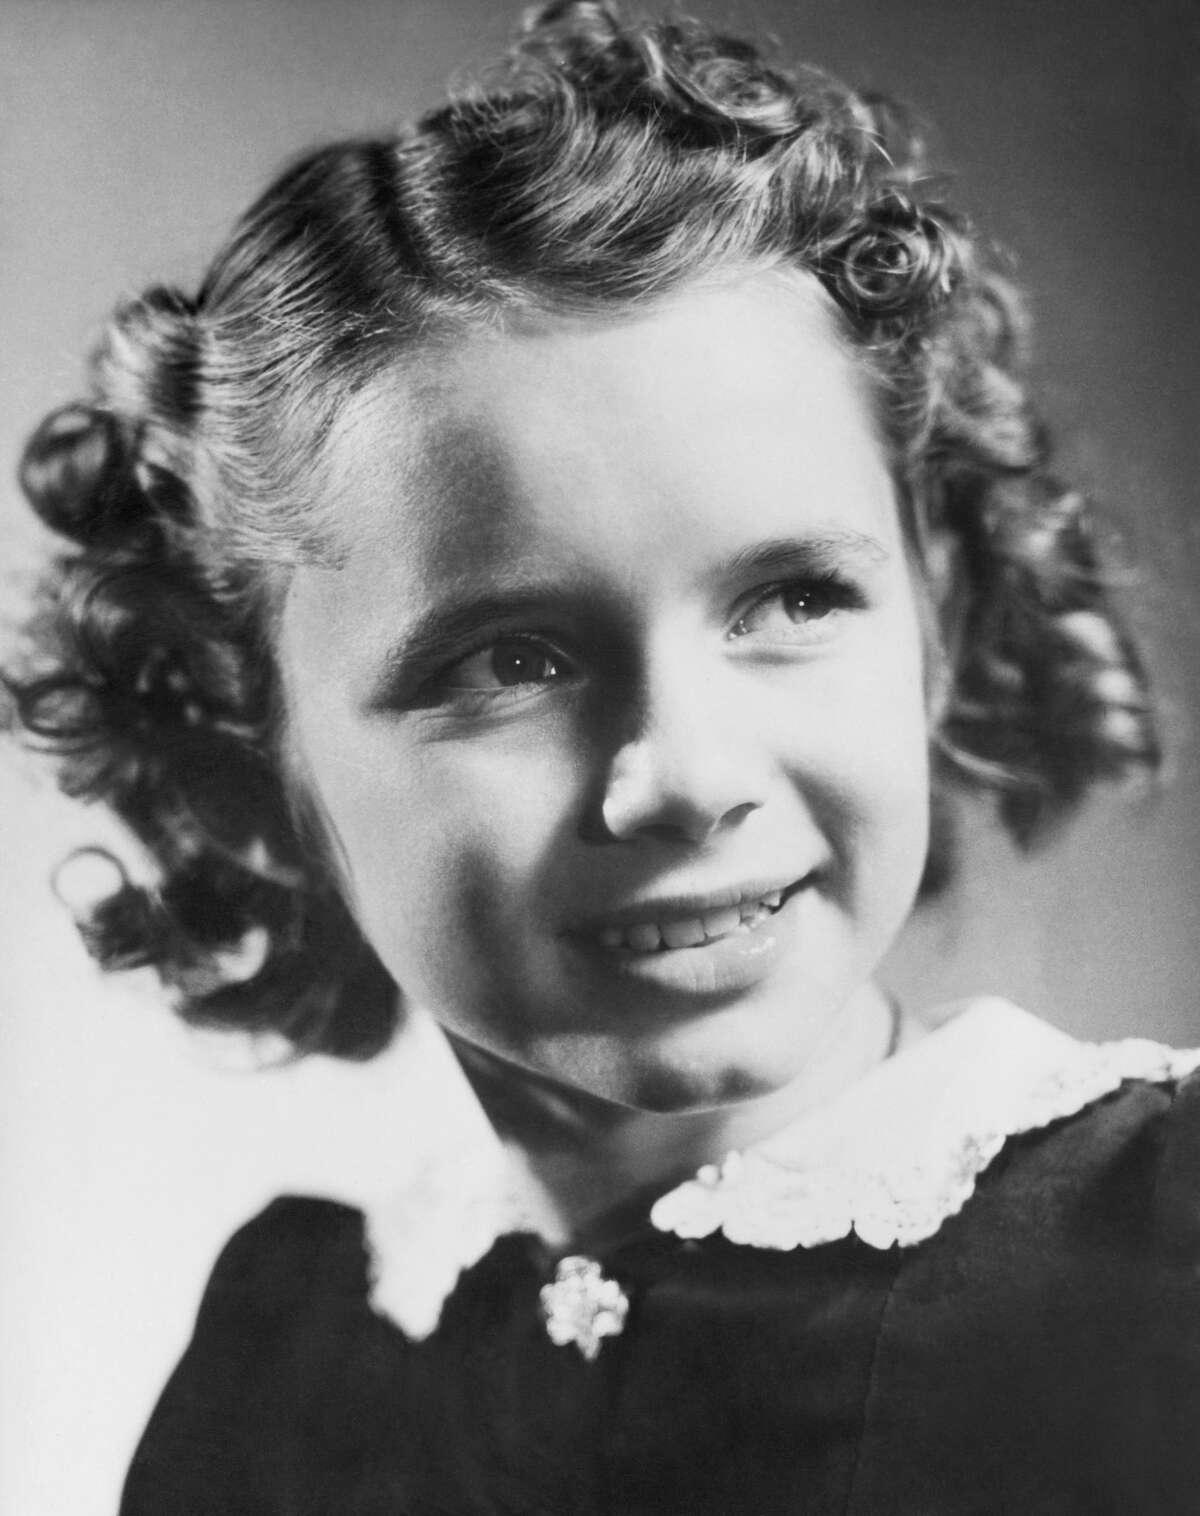 Debbie Reynolds as a child.